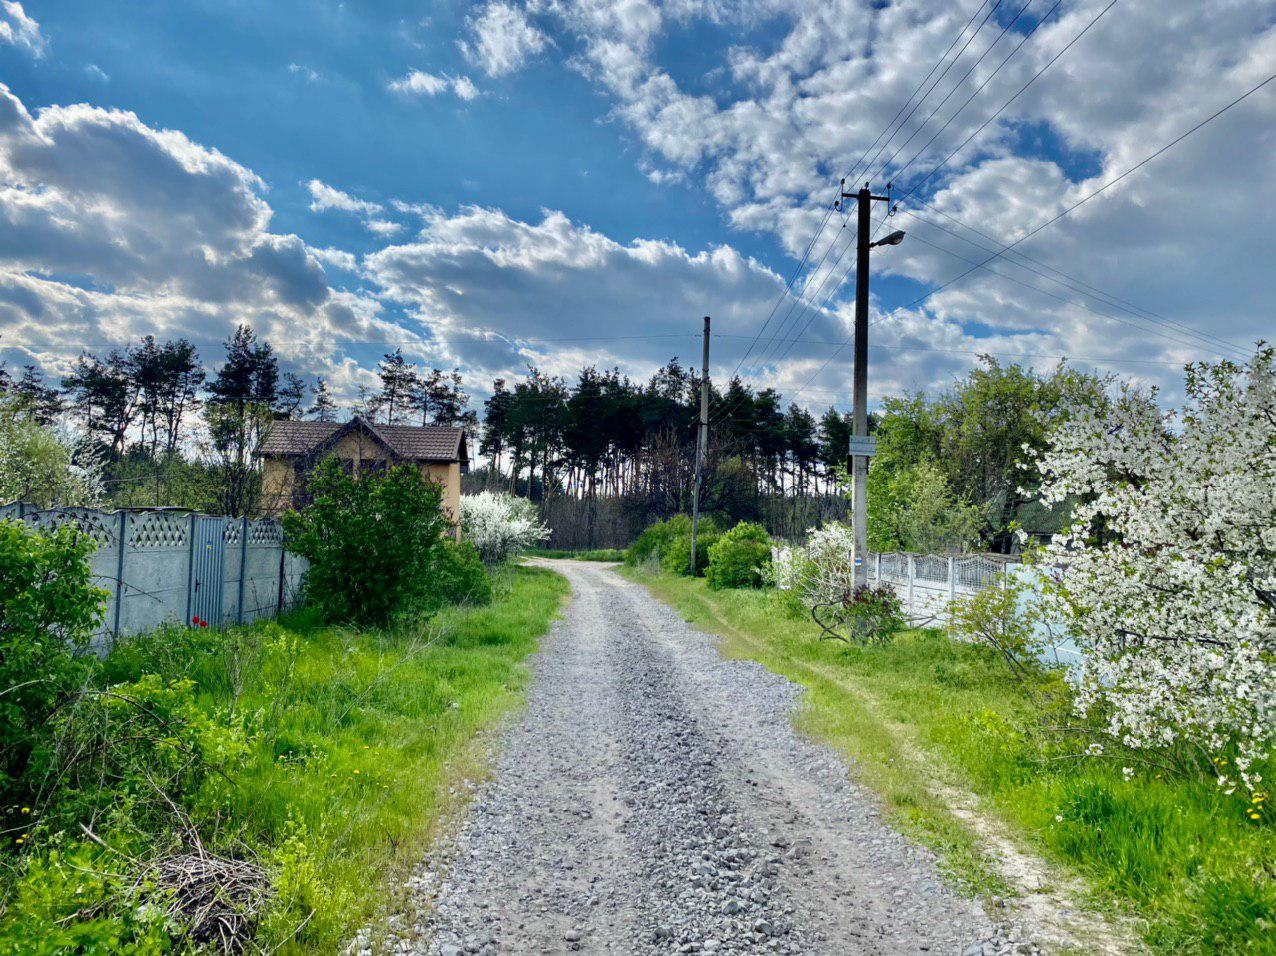 Участок ул.Чапаева возле леса